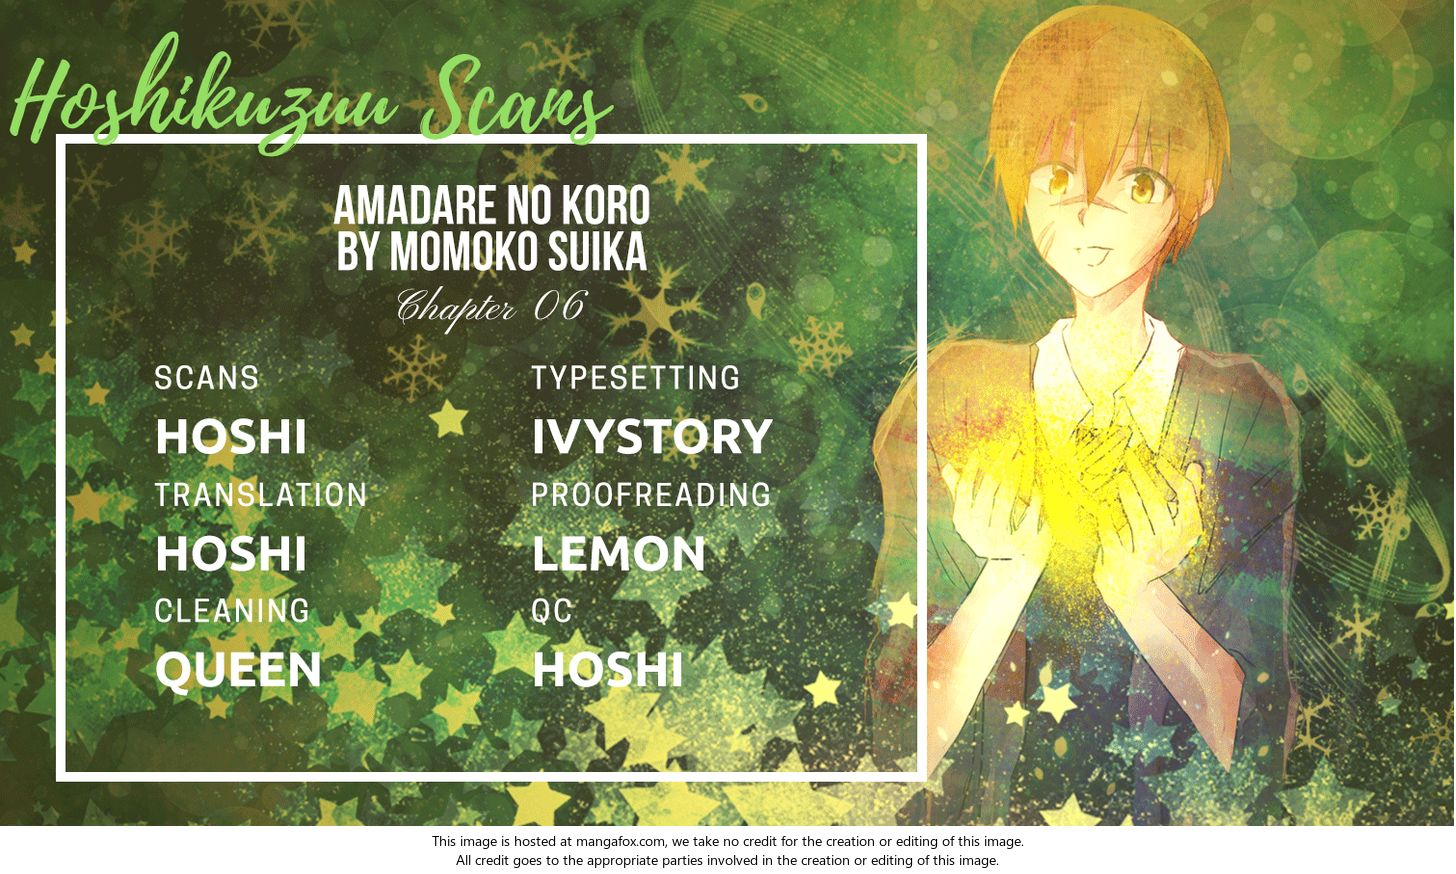 Amadare no Koro 6 at MangaFox